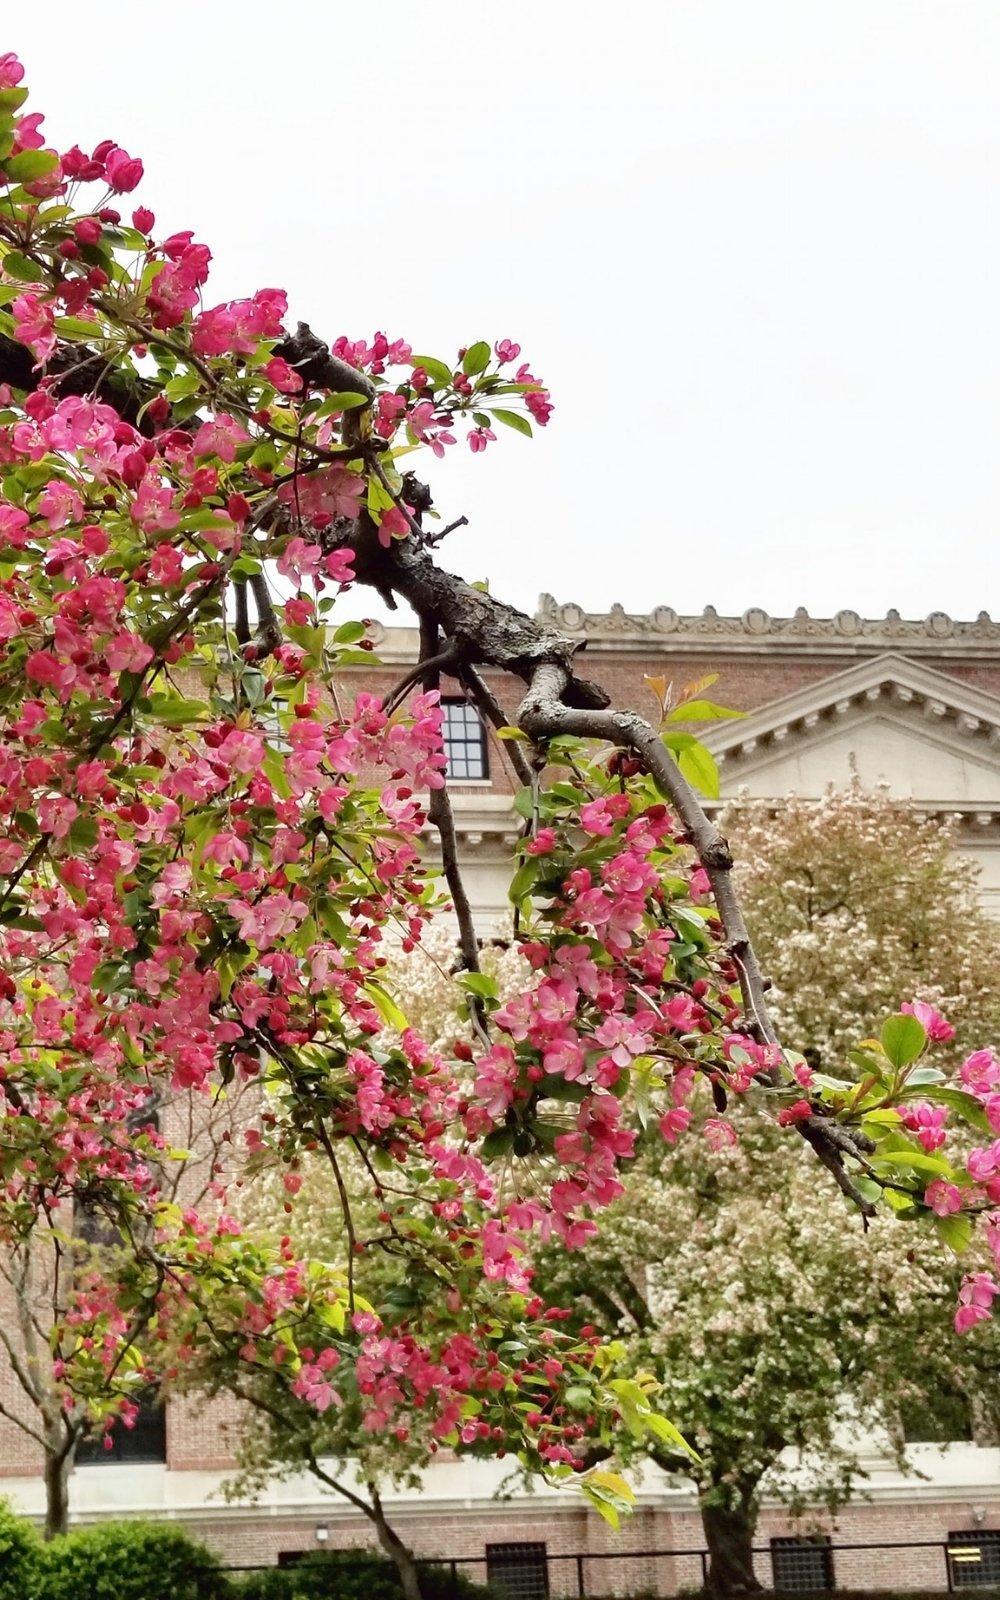 spring in boston ma; spring in boston; spring flowers in boston, ma; spring boston things to do